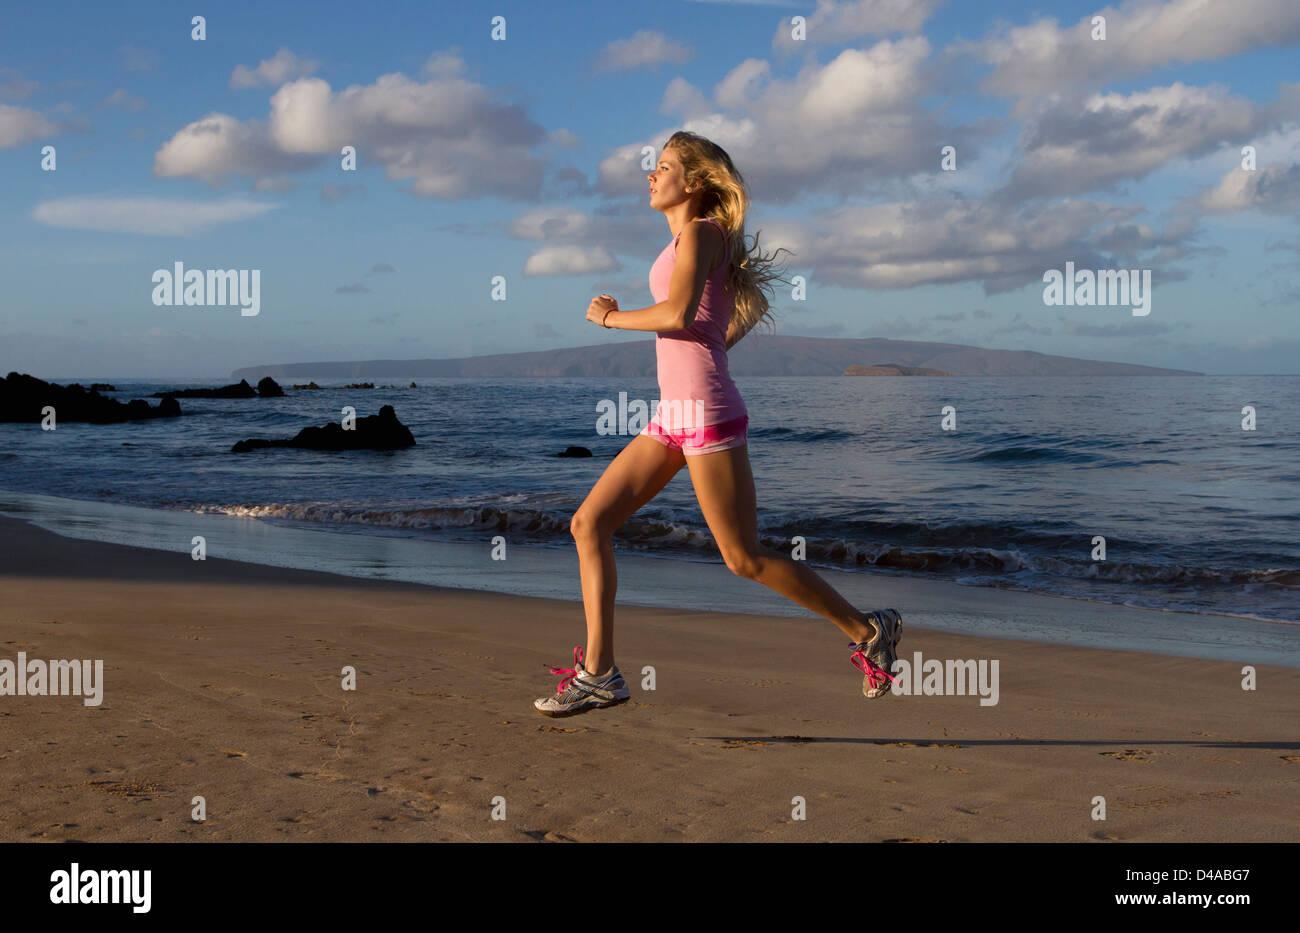 A healthy, fit woman exercises at the beach at Wailea, Maui, Hawaii. - Stock Image